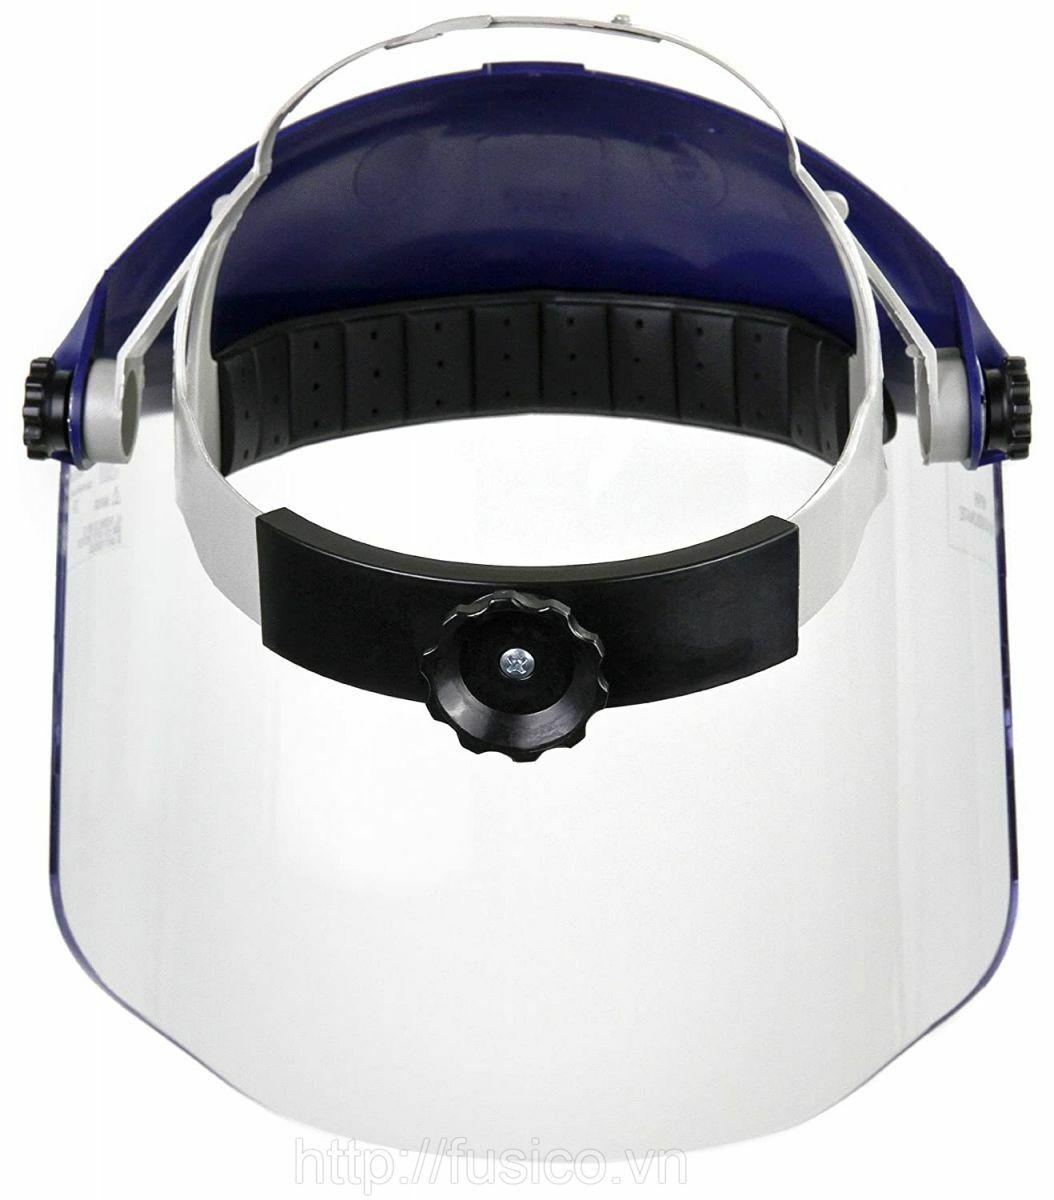 Thiết bị gắn che kính che mặt 3M H8A